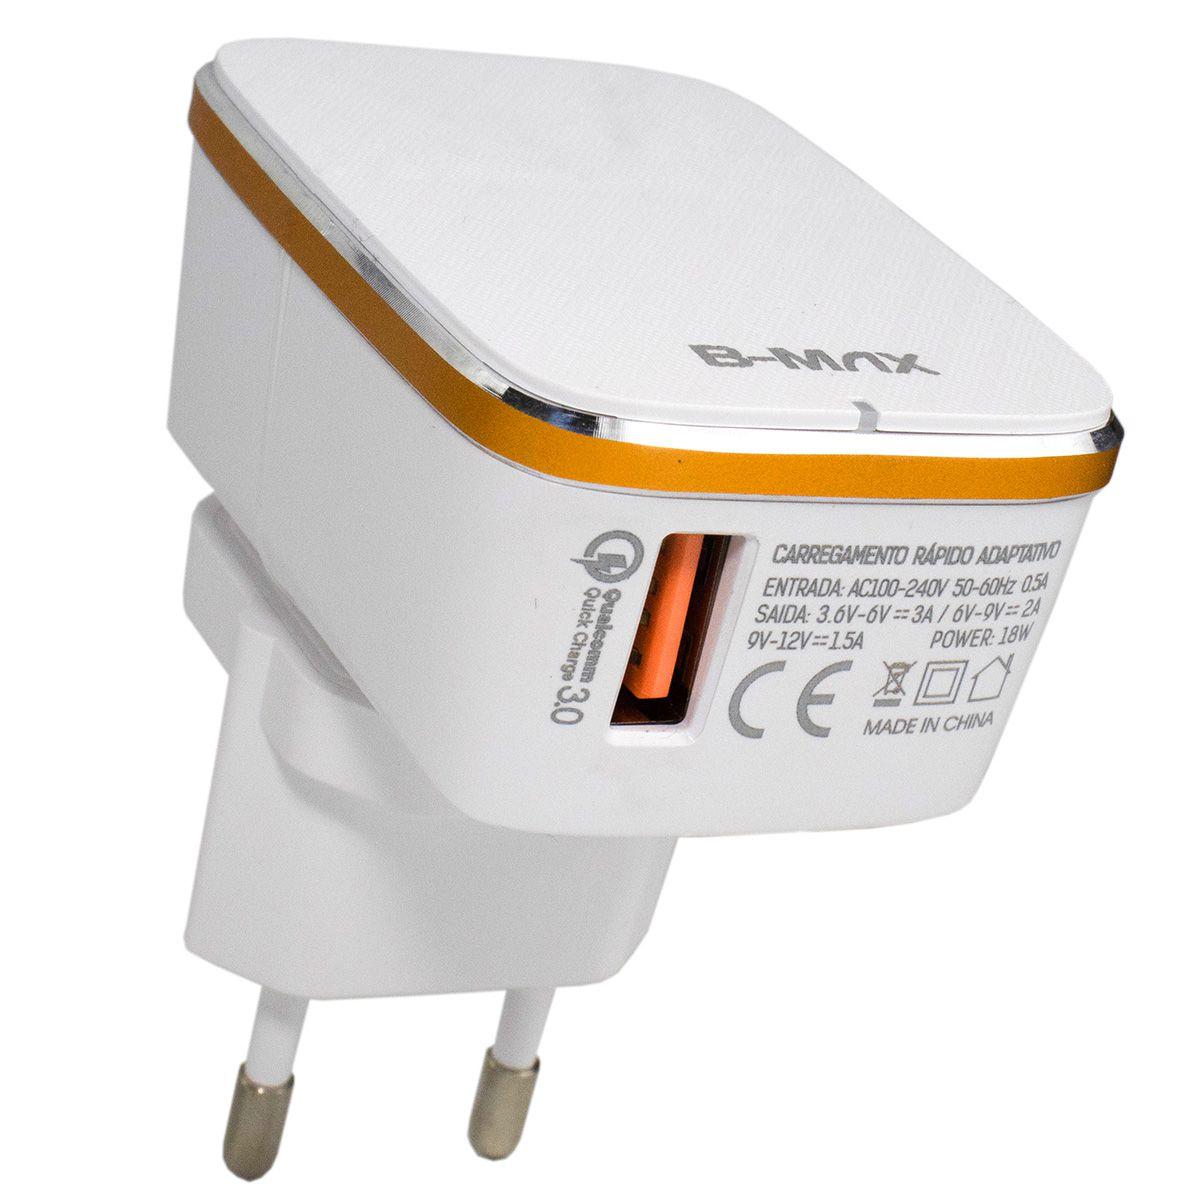 Carregador Turbo Quick Charge 3.0 18w para Celular USB Tipo C B-Max BM8609